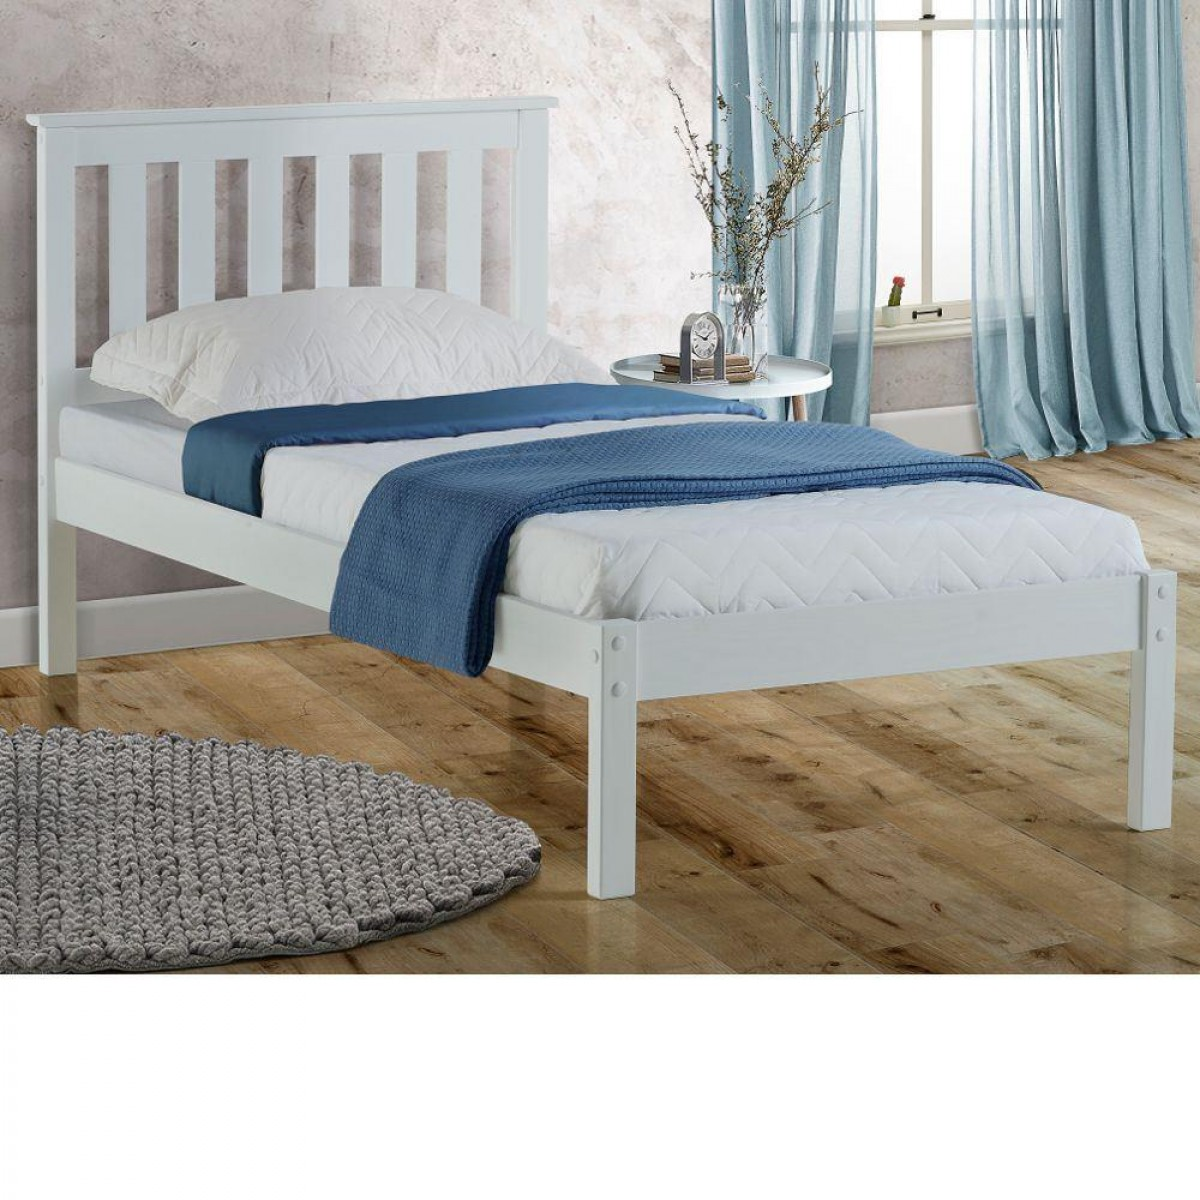 Denver White Solid Pine Wooden Bed